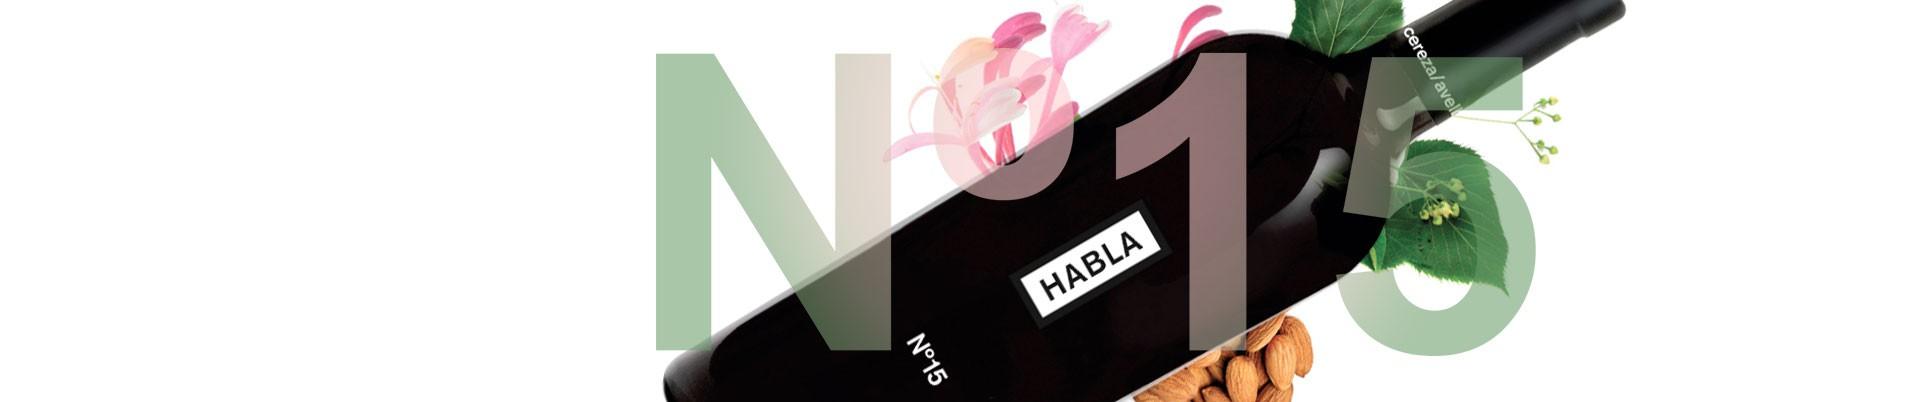 Vino y Más GmbH | WeinUndMehr Habla Nº 15